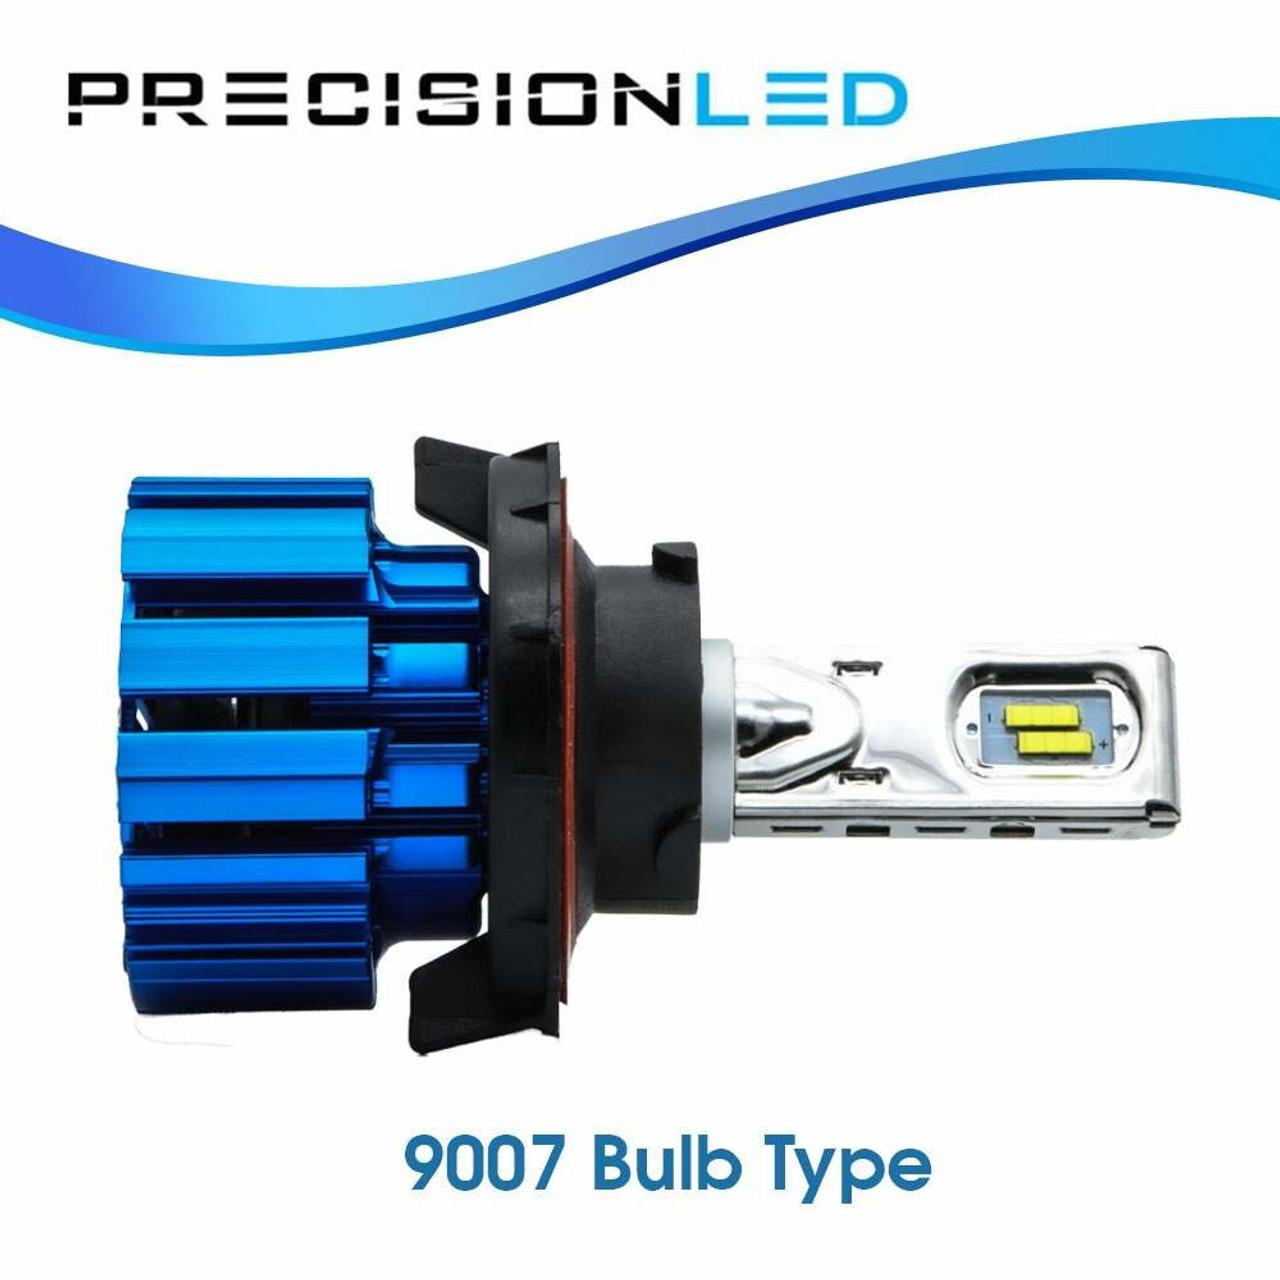 Ford Windstar Premium LED Headlight package (1999 - 2003)